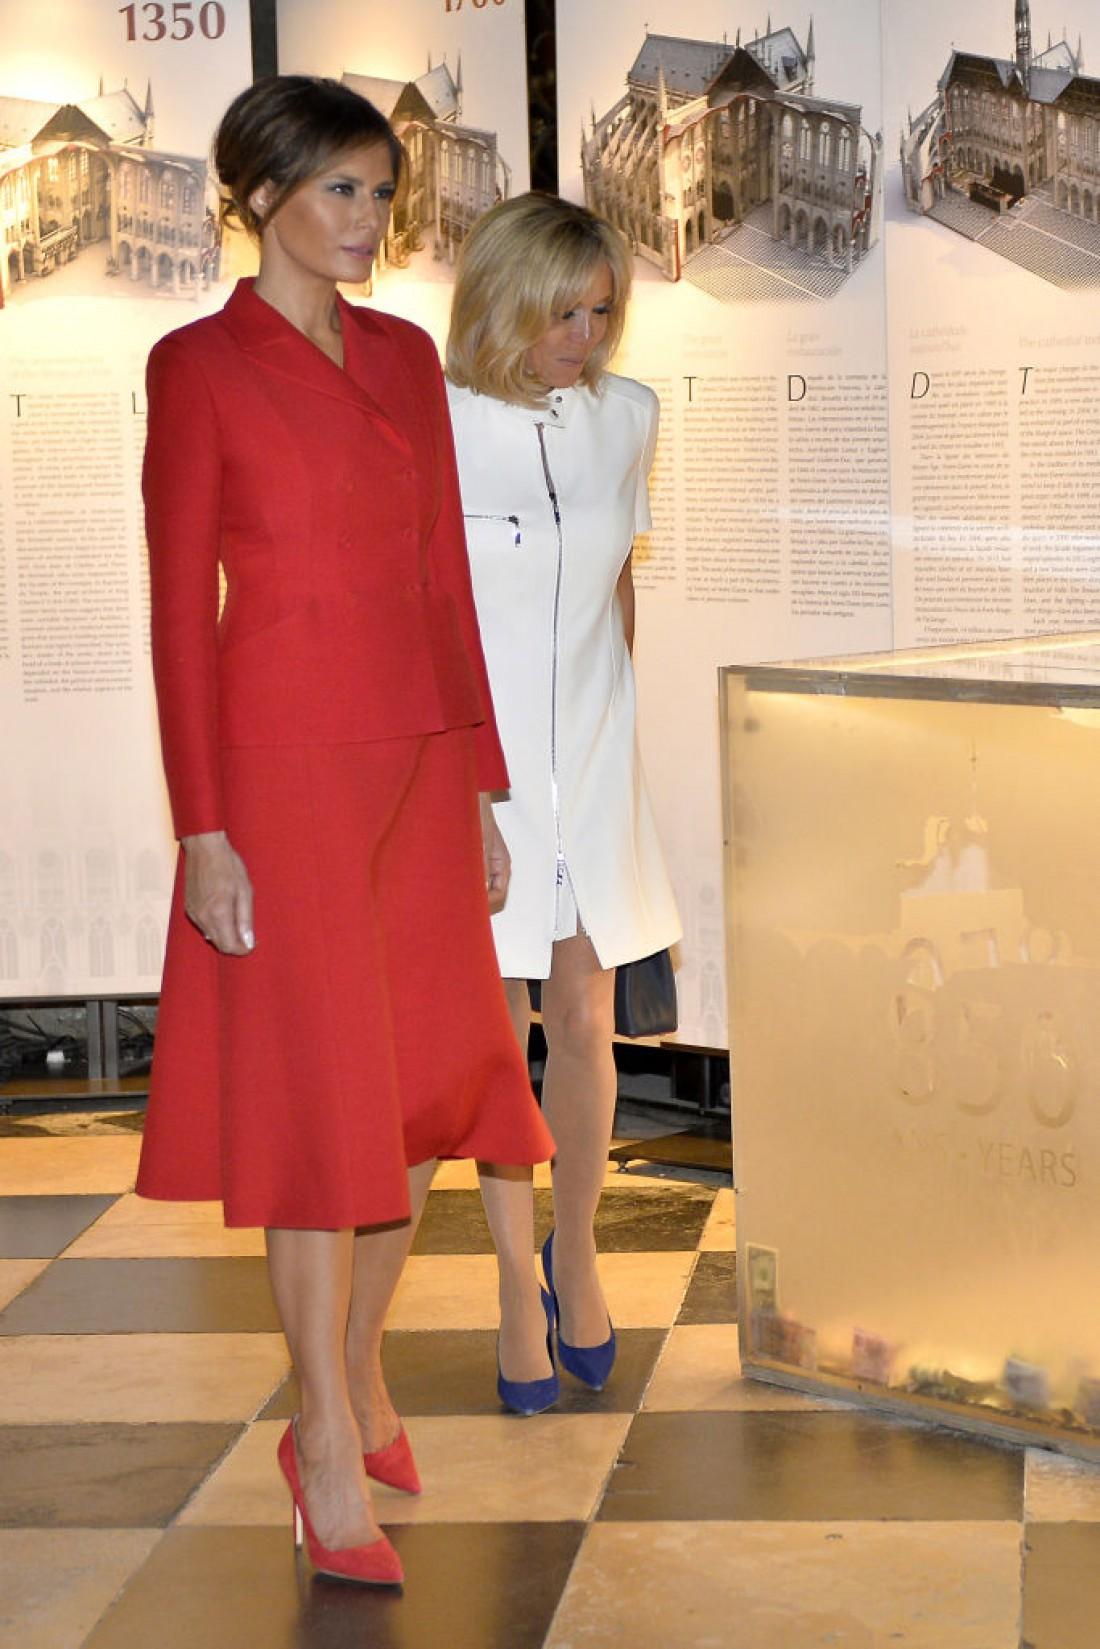 Меланья Трамп посетила Париж в наряде от Dior